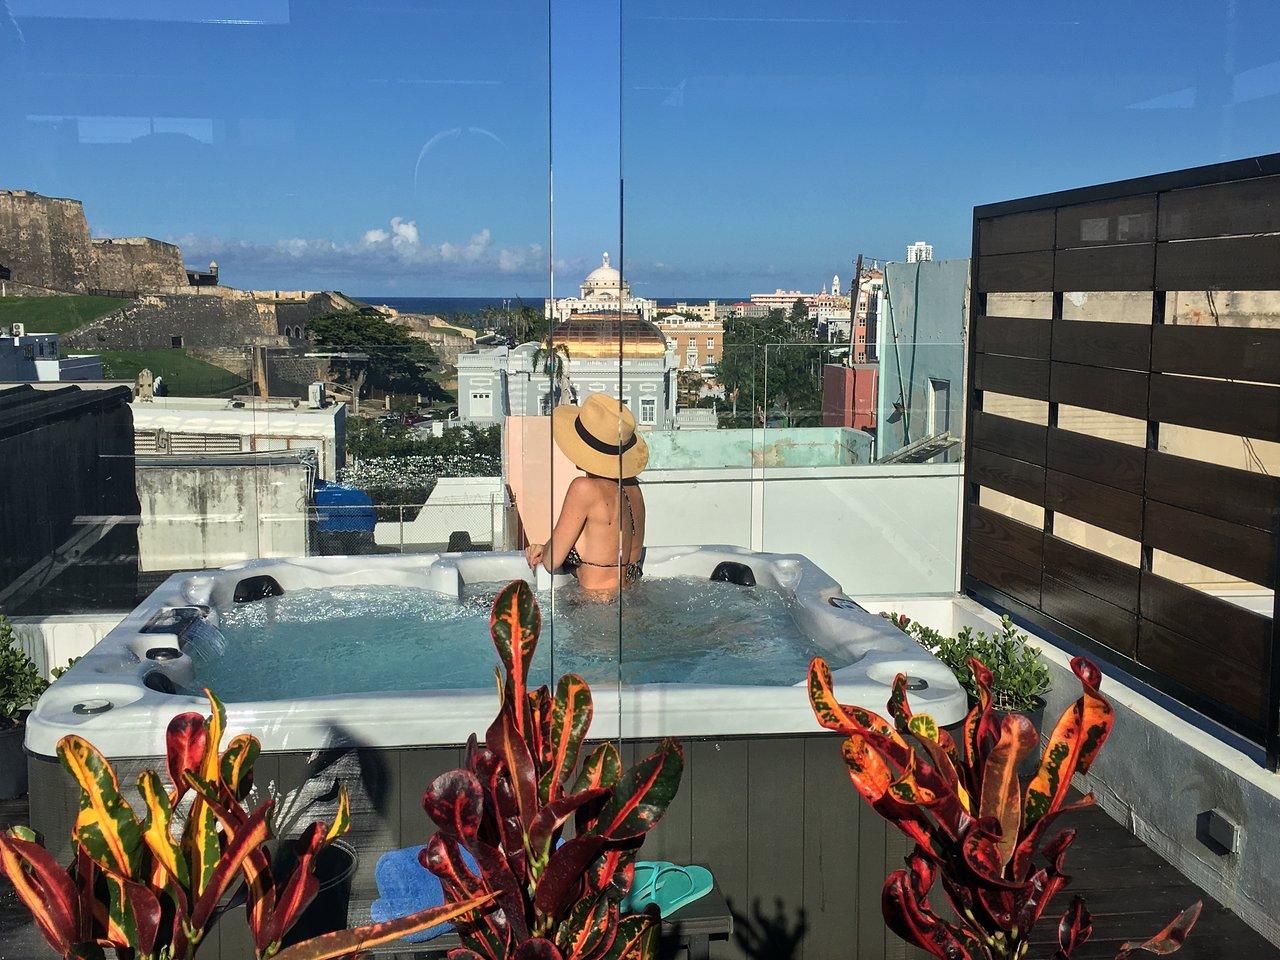 THE 10 BEST Hotels in San Juan for 2019 (from $32) - TripAdvisor